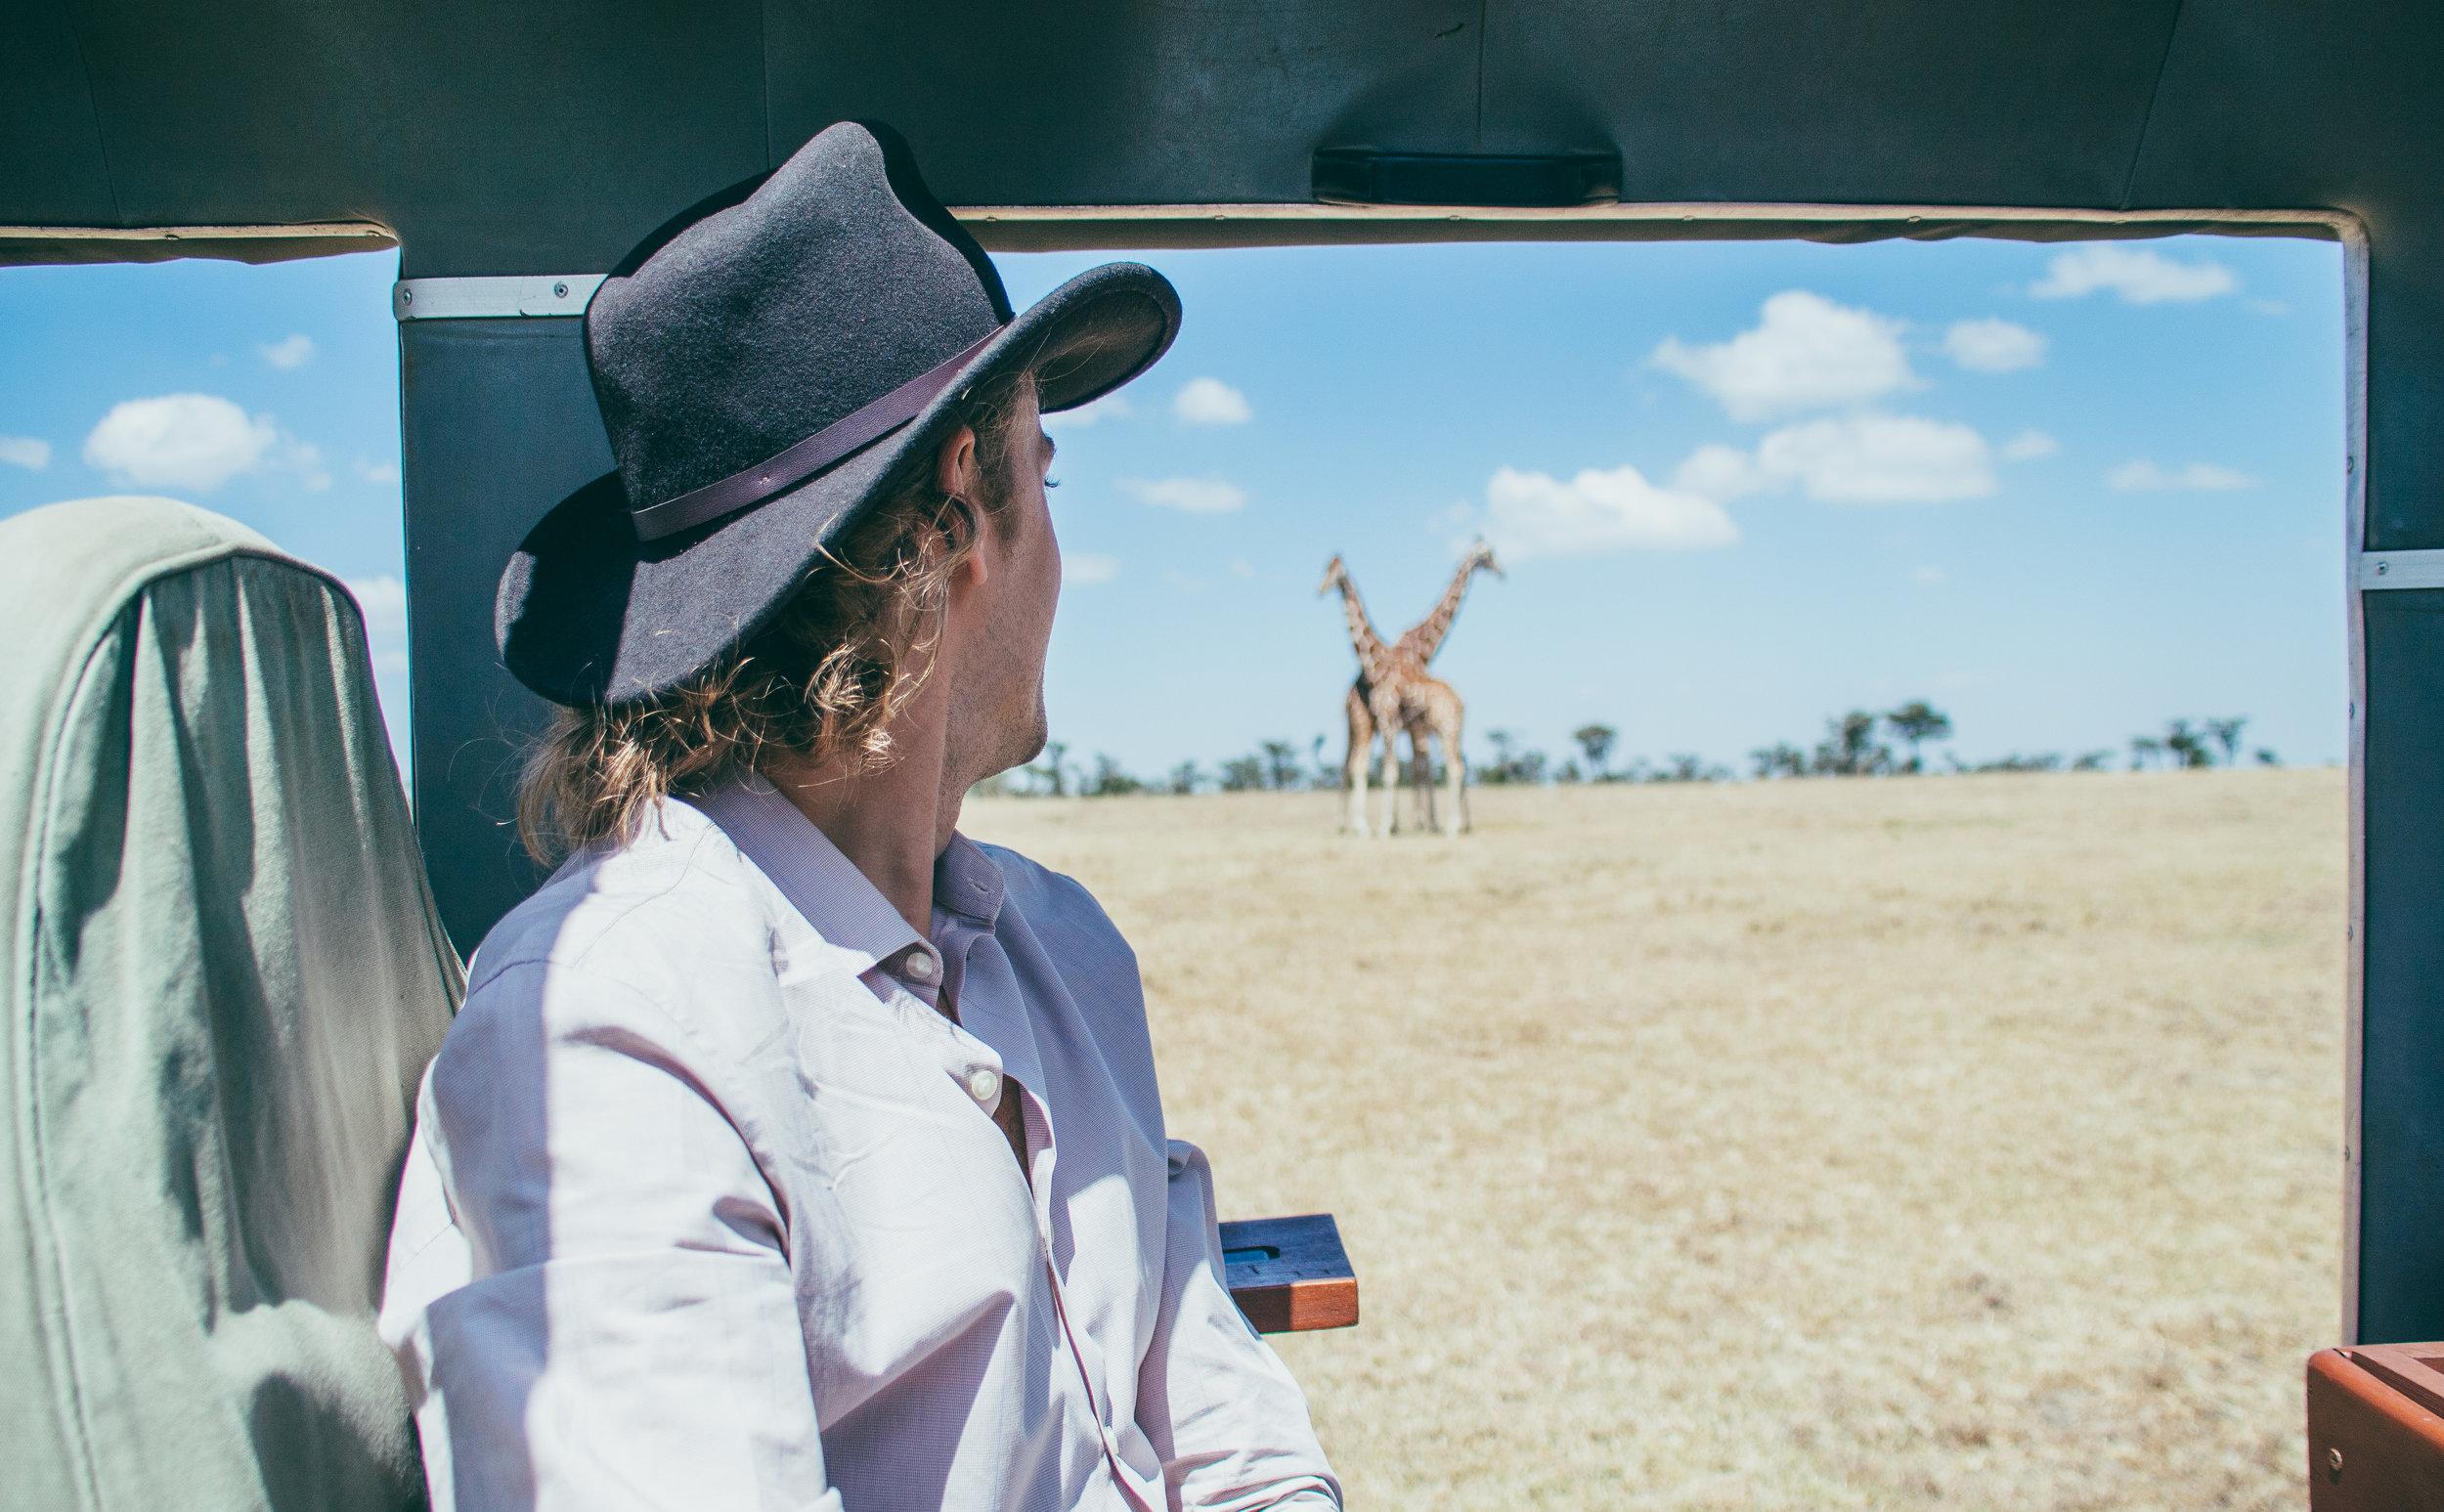 The Kicheche Laikipia Safari Couple's Escape, Kenya Africa